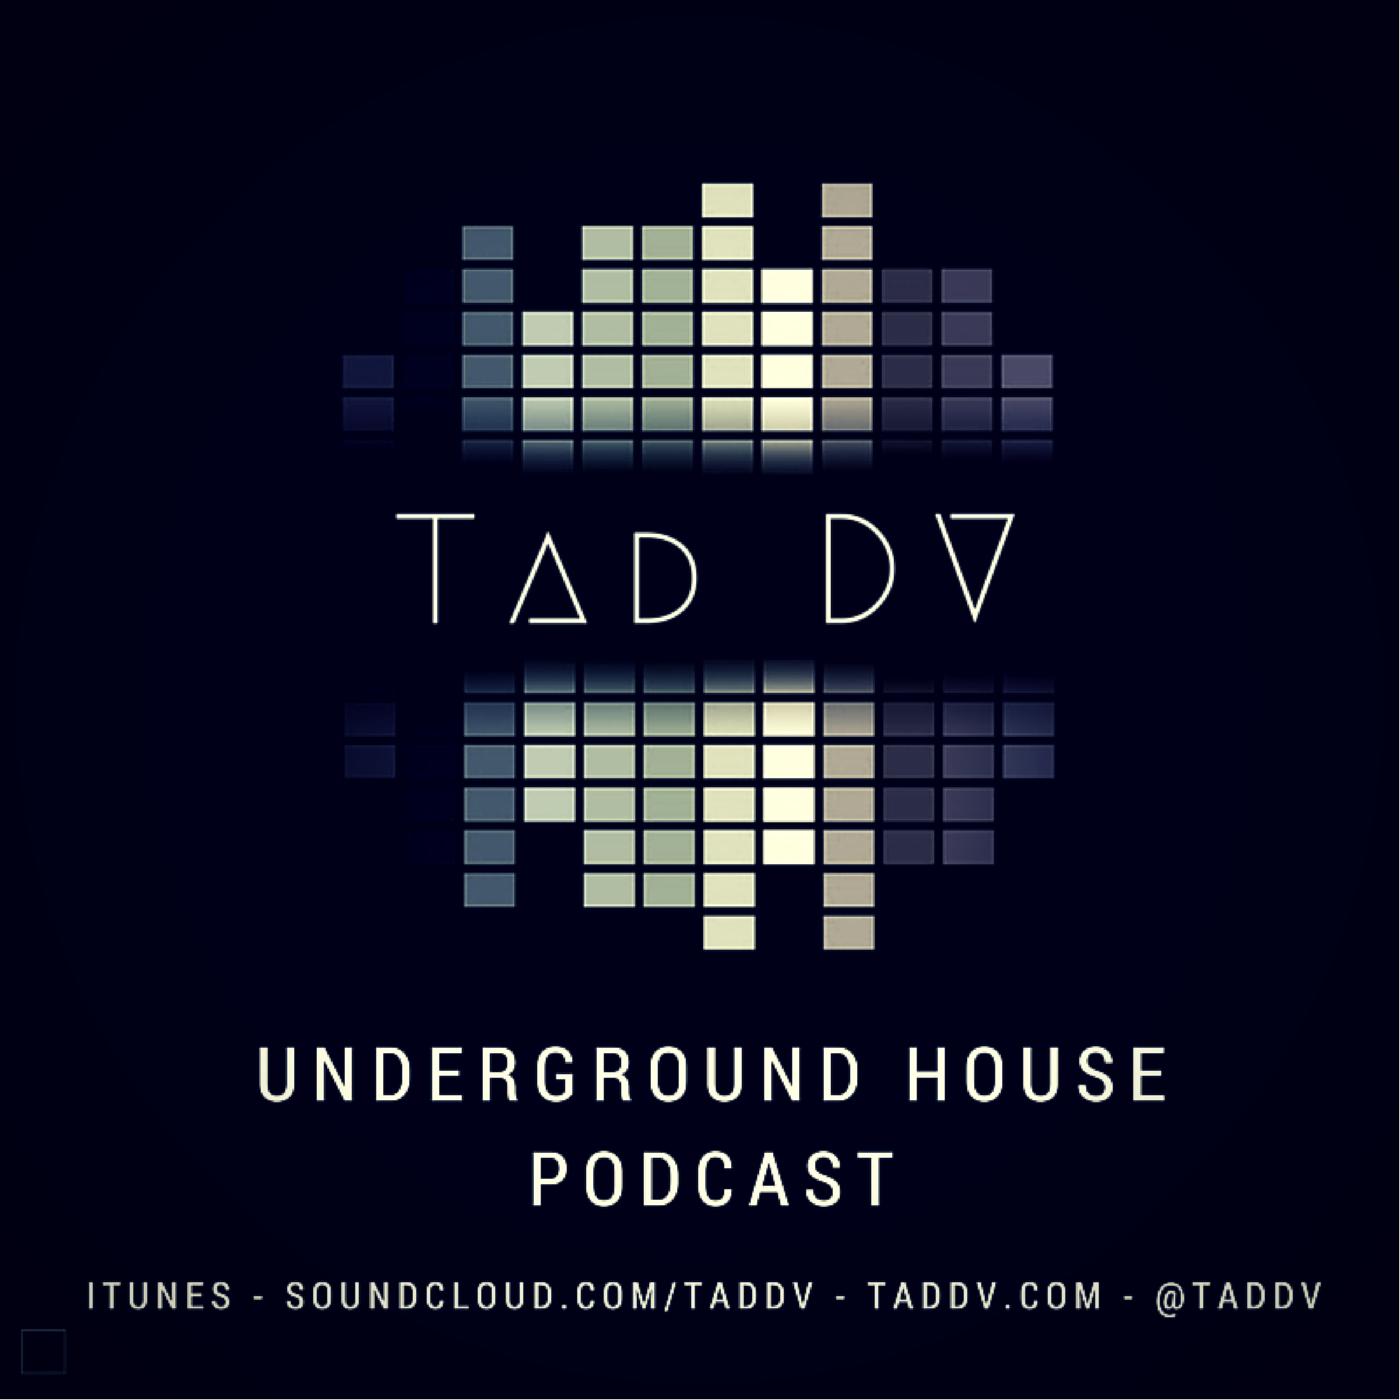 Tad DV - Underground House